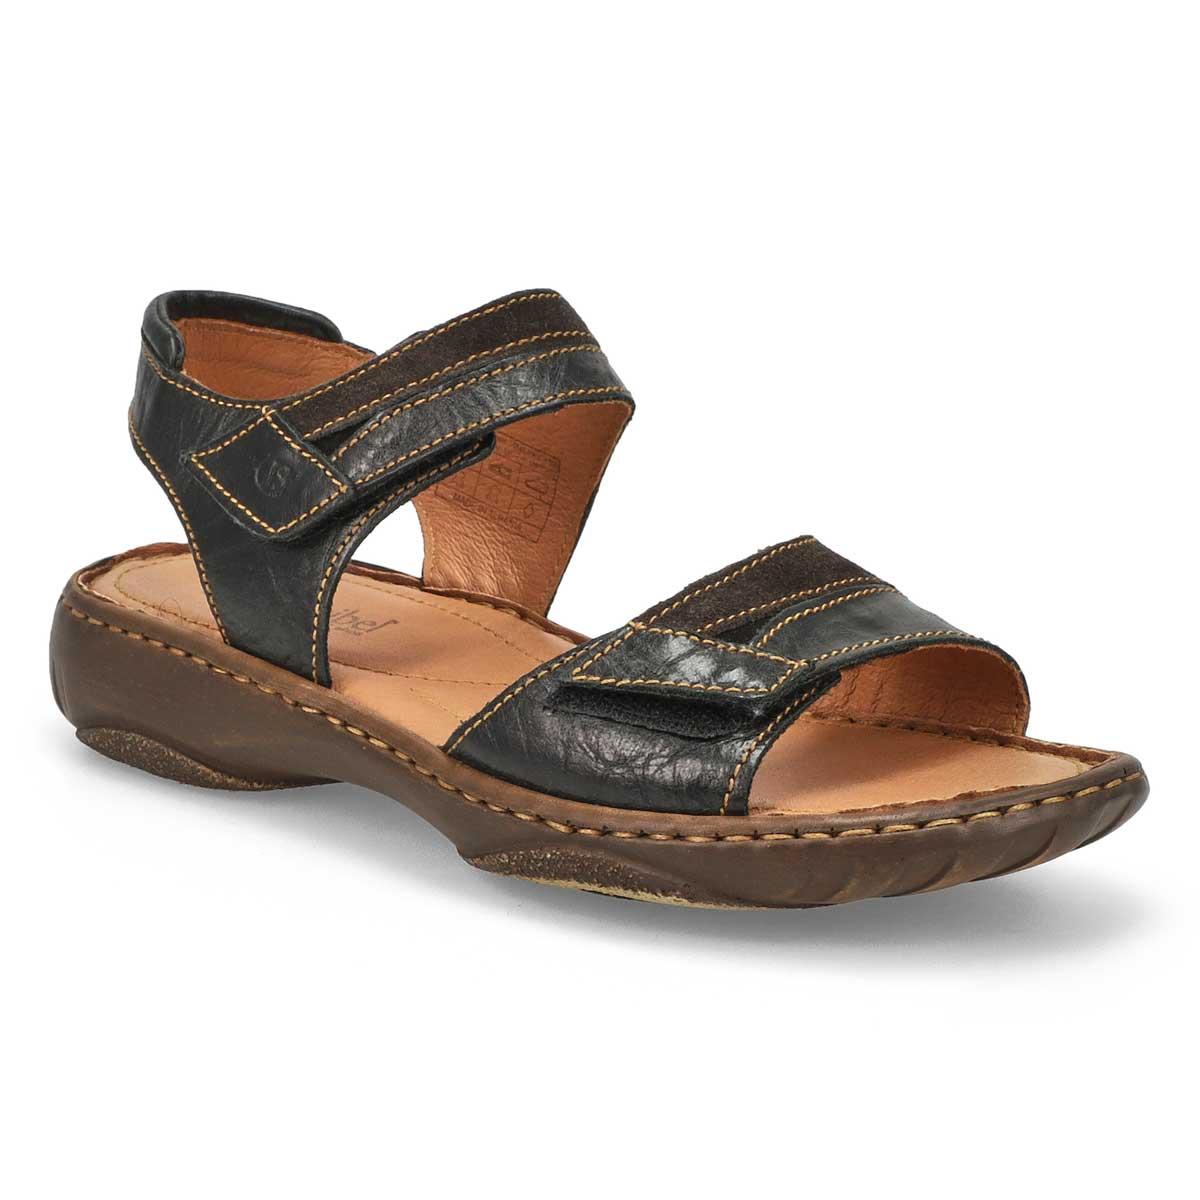 Women's Debra 19 Casual 2 Strap Sandals - Black